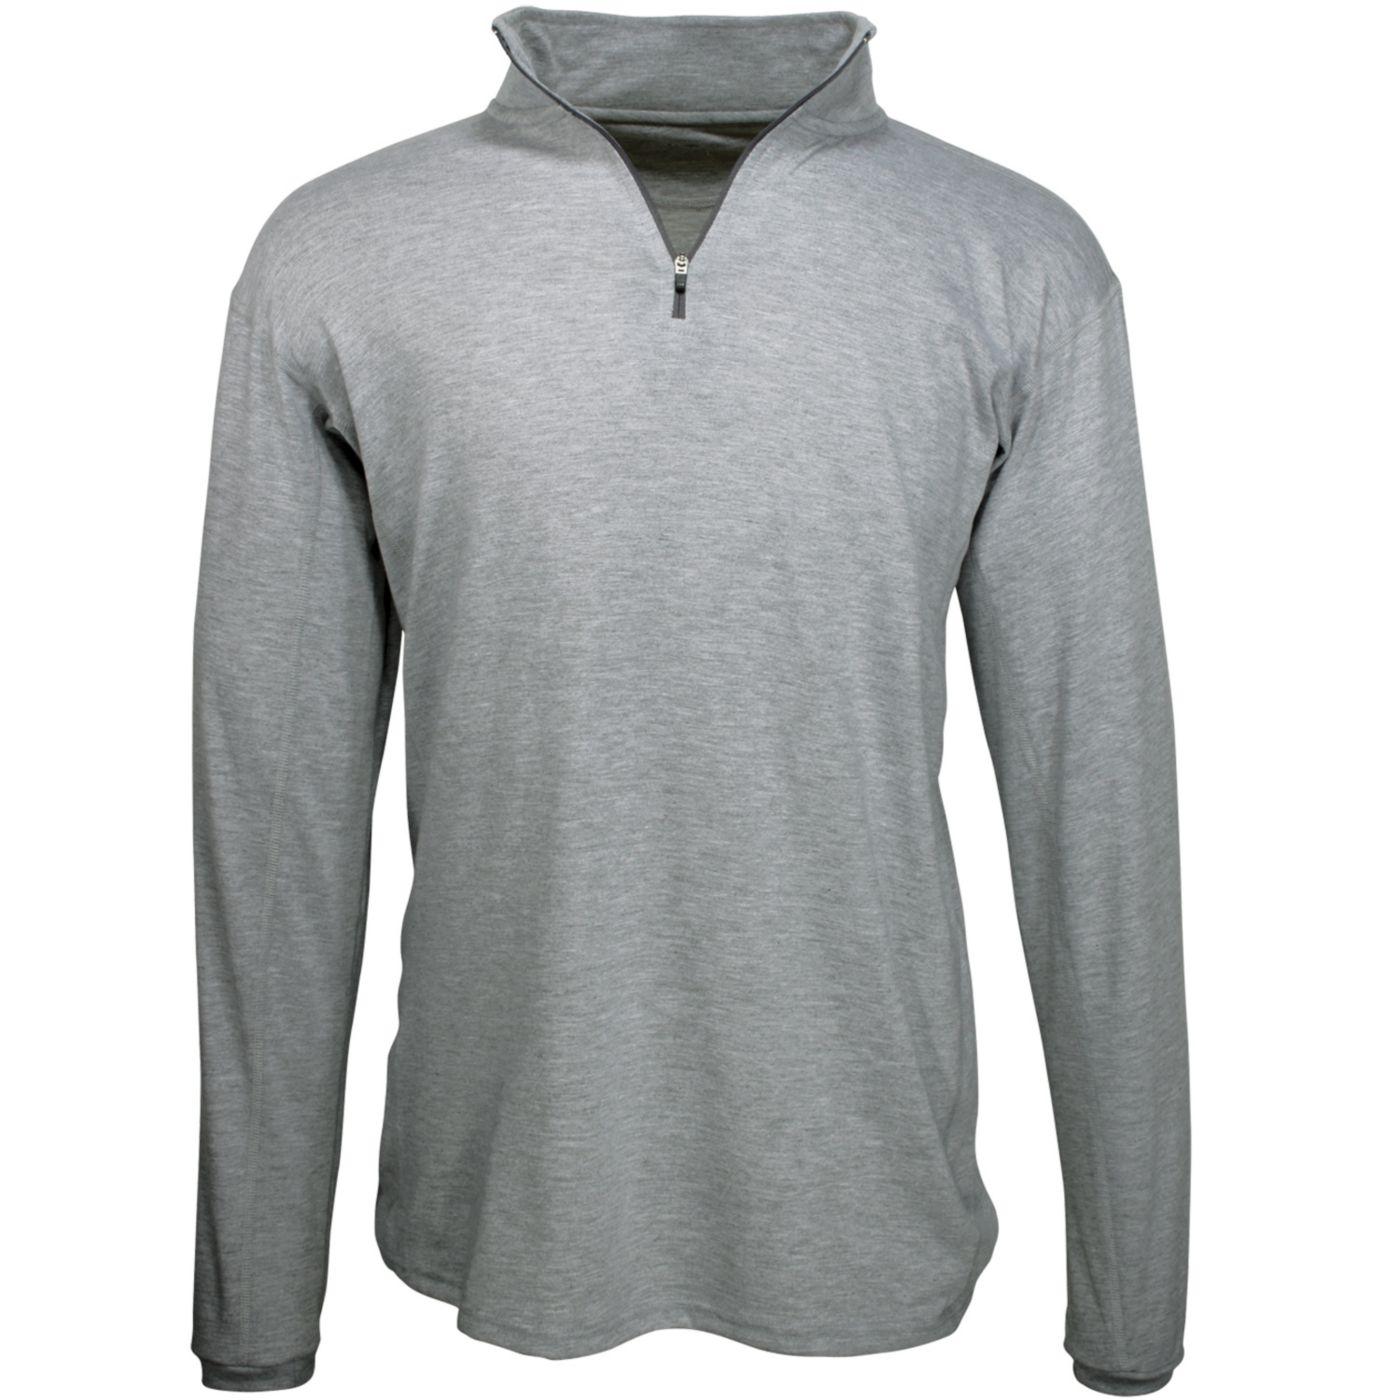 Arborwear Men's Quarter Zip Tech Pullover